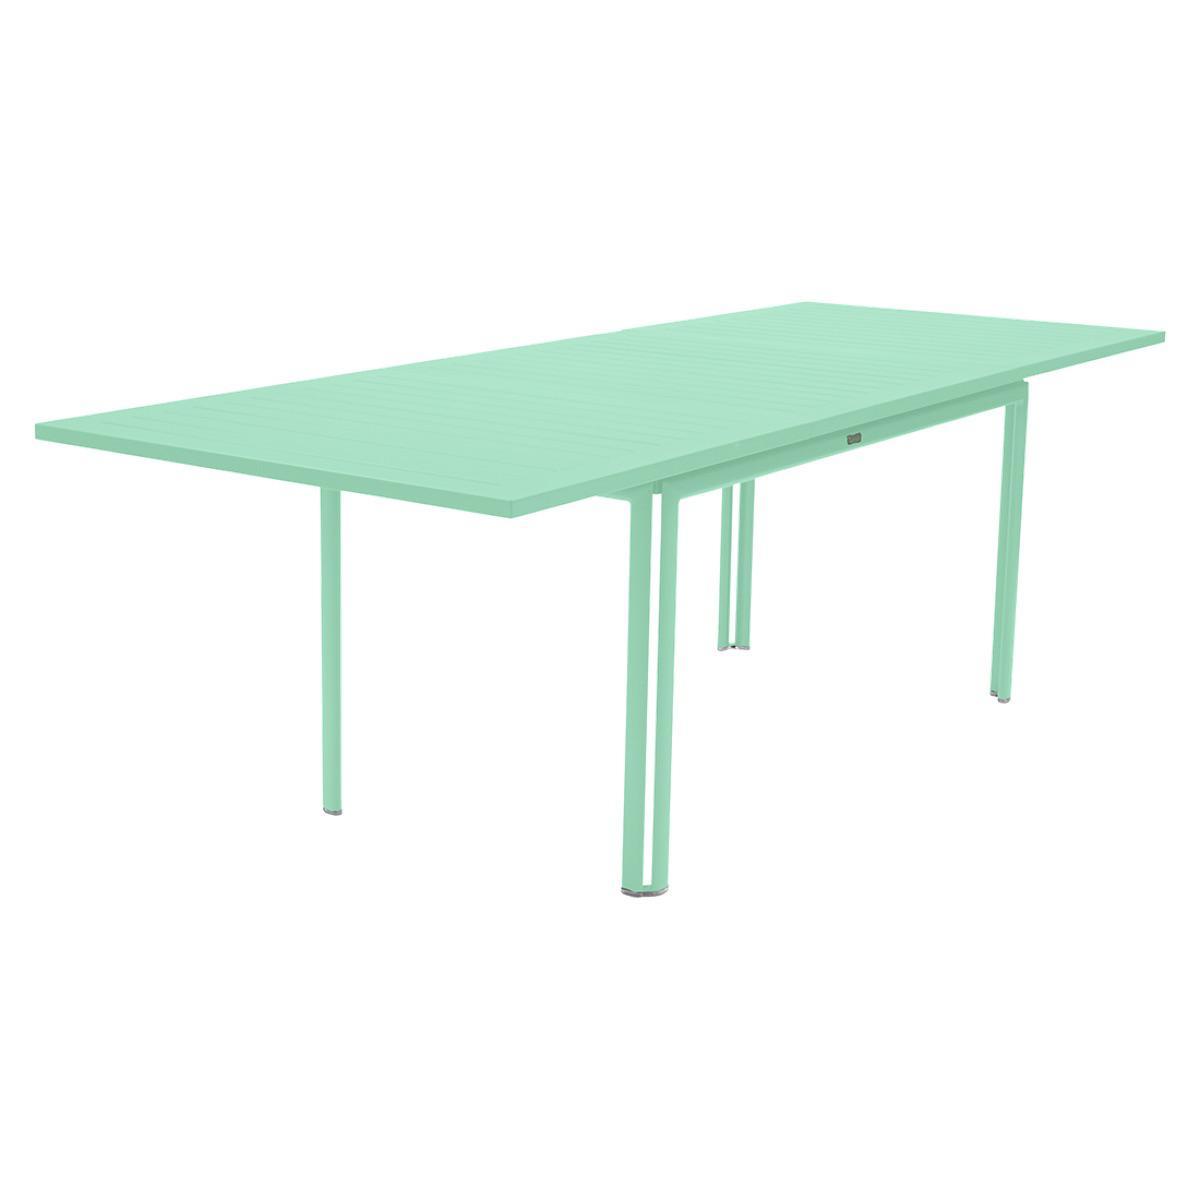 Table à rallonge 90x160/240cm COSTA Fermob vert opaline